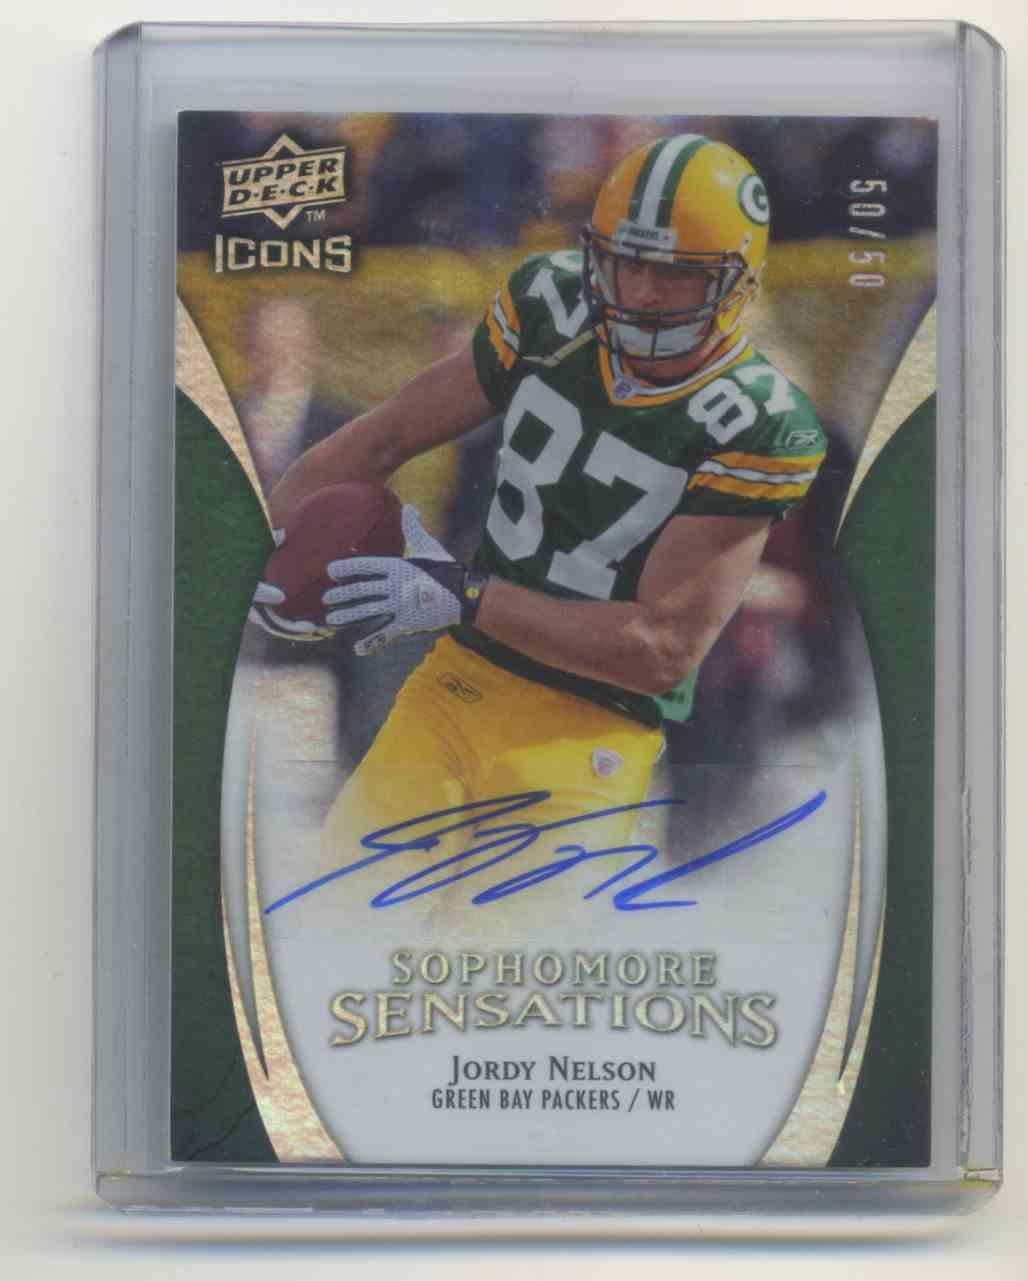 2009 Upper Deck Icons Sophomore Sensations Autographs Jordy Nelson #SS-JN card front image